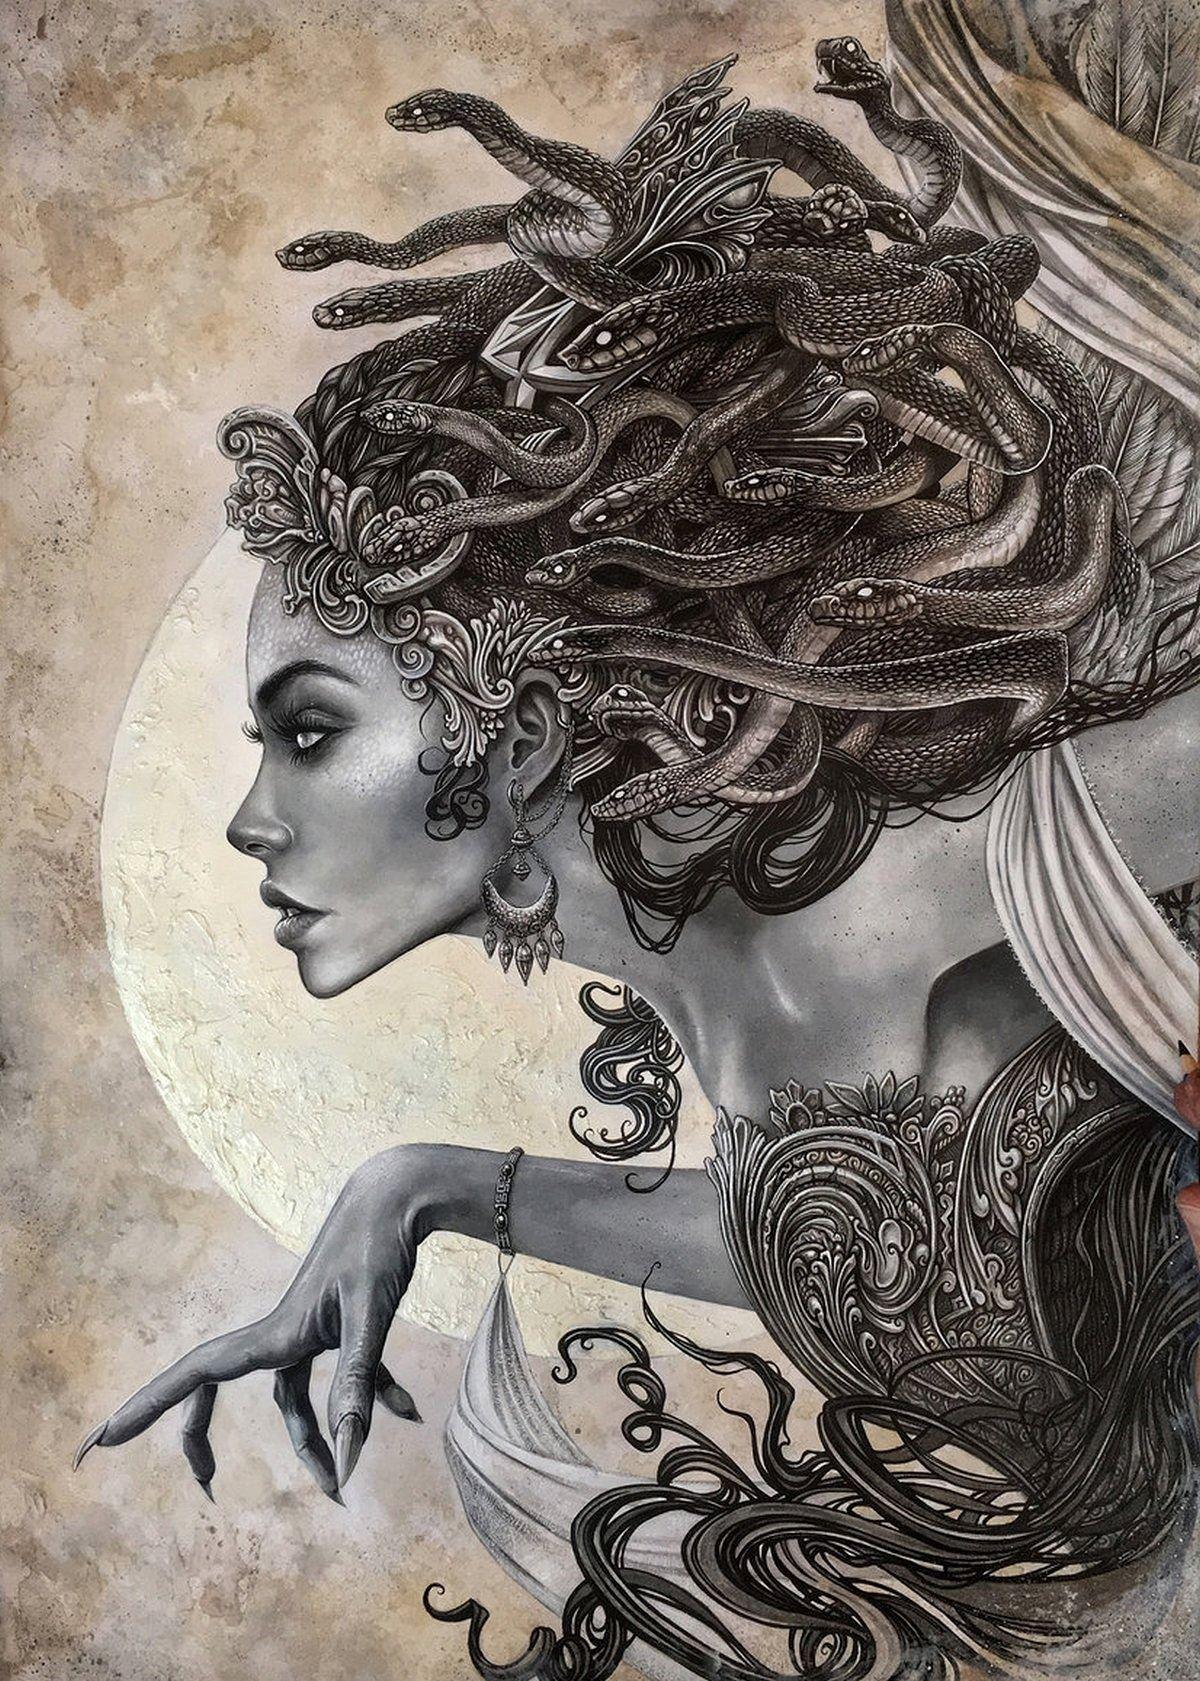 Medusa Tatuajes Mitologia Griega Ilustraciones Mitología Griega Mitología